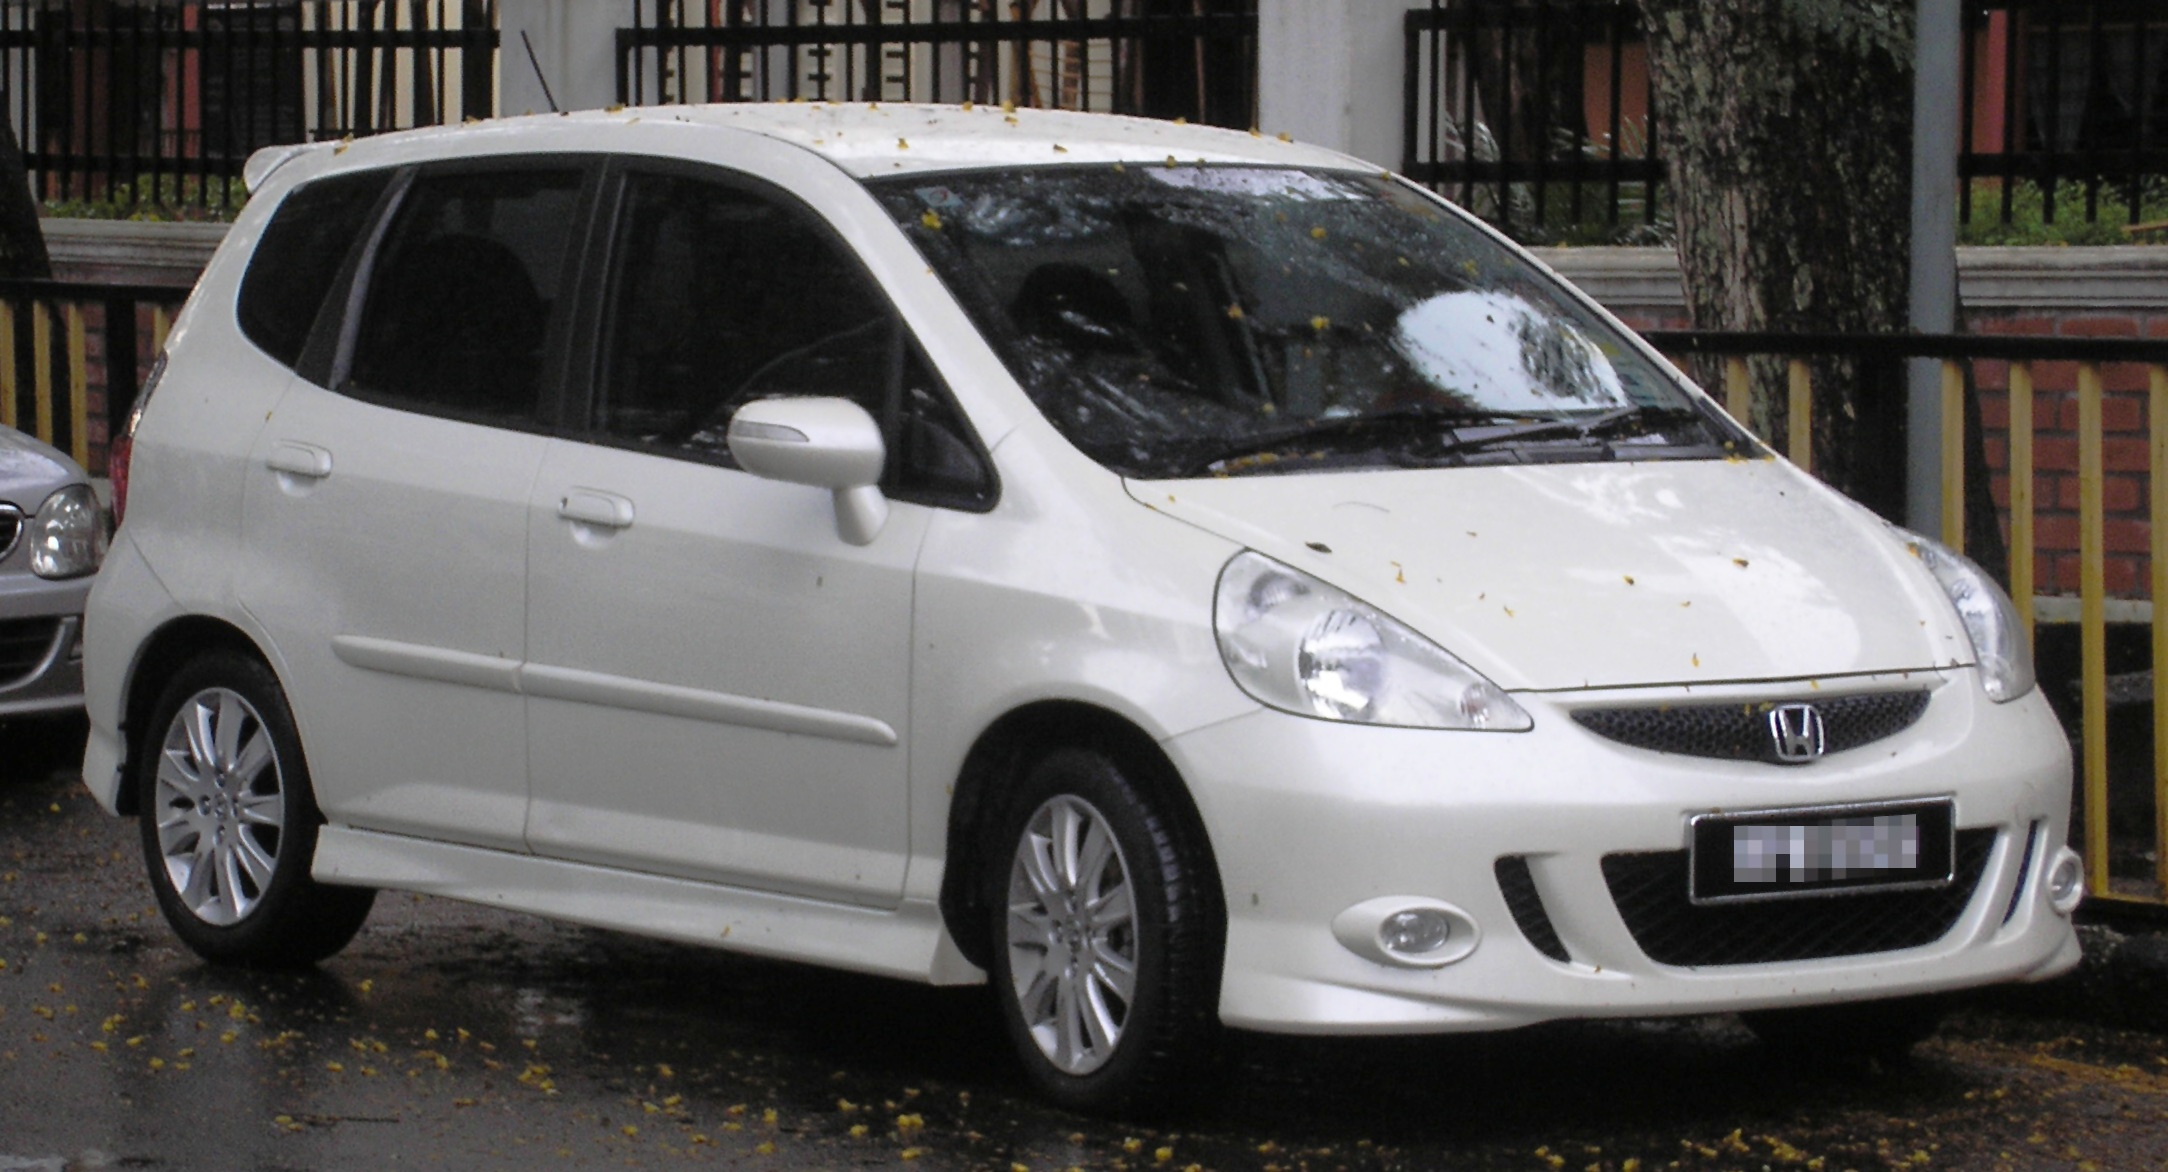 File:Honda Jazz (first generation, first facelift) (front), Kuala Lumpur.jpg - Wikimedia Commons